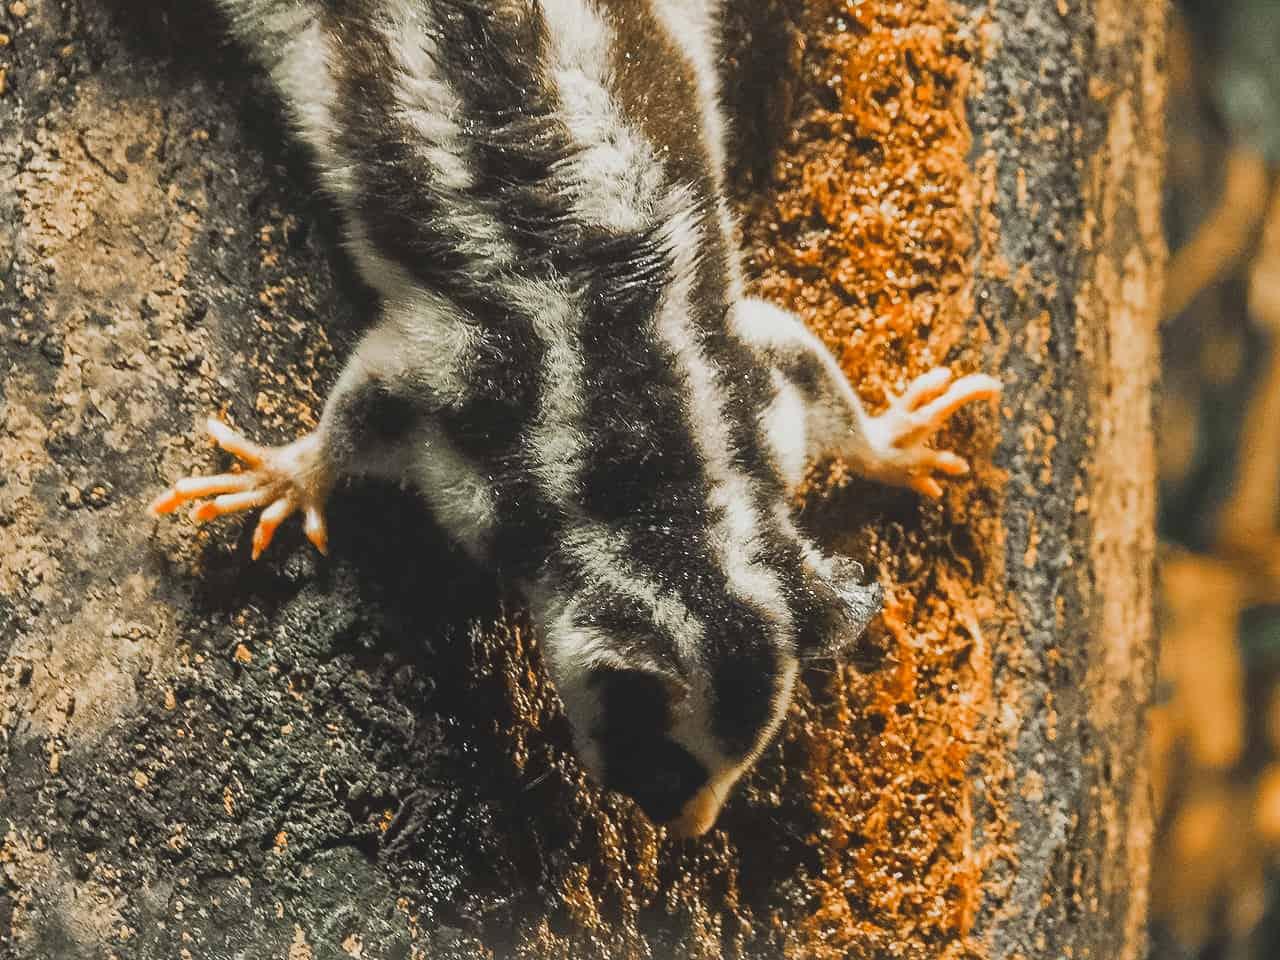 striped-possum-Chambers-Wildlife-Lodge-Atherton-Tablelands-North-Queensland-Australia ] Travel Mermaid 011